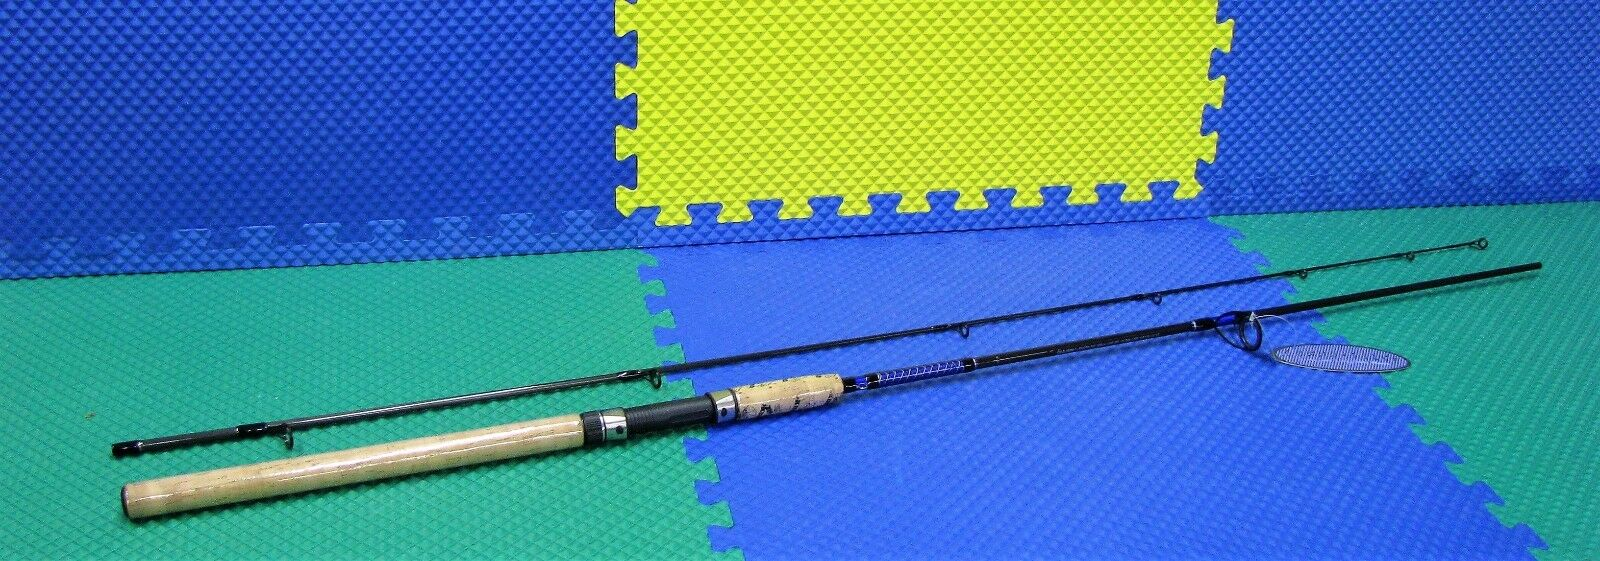 Okuma Connoisseur Steelhead Premium  Graphite 8' 6  Spinning Rod 2Pc CQ-S-862M-1  sale online discount low price